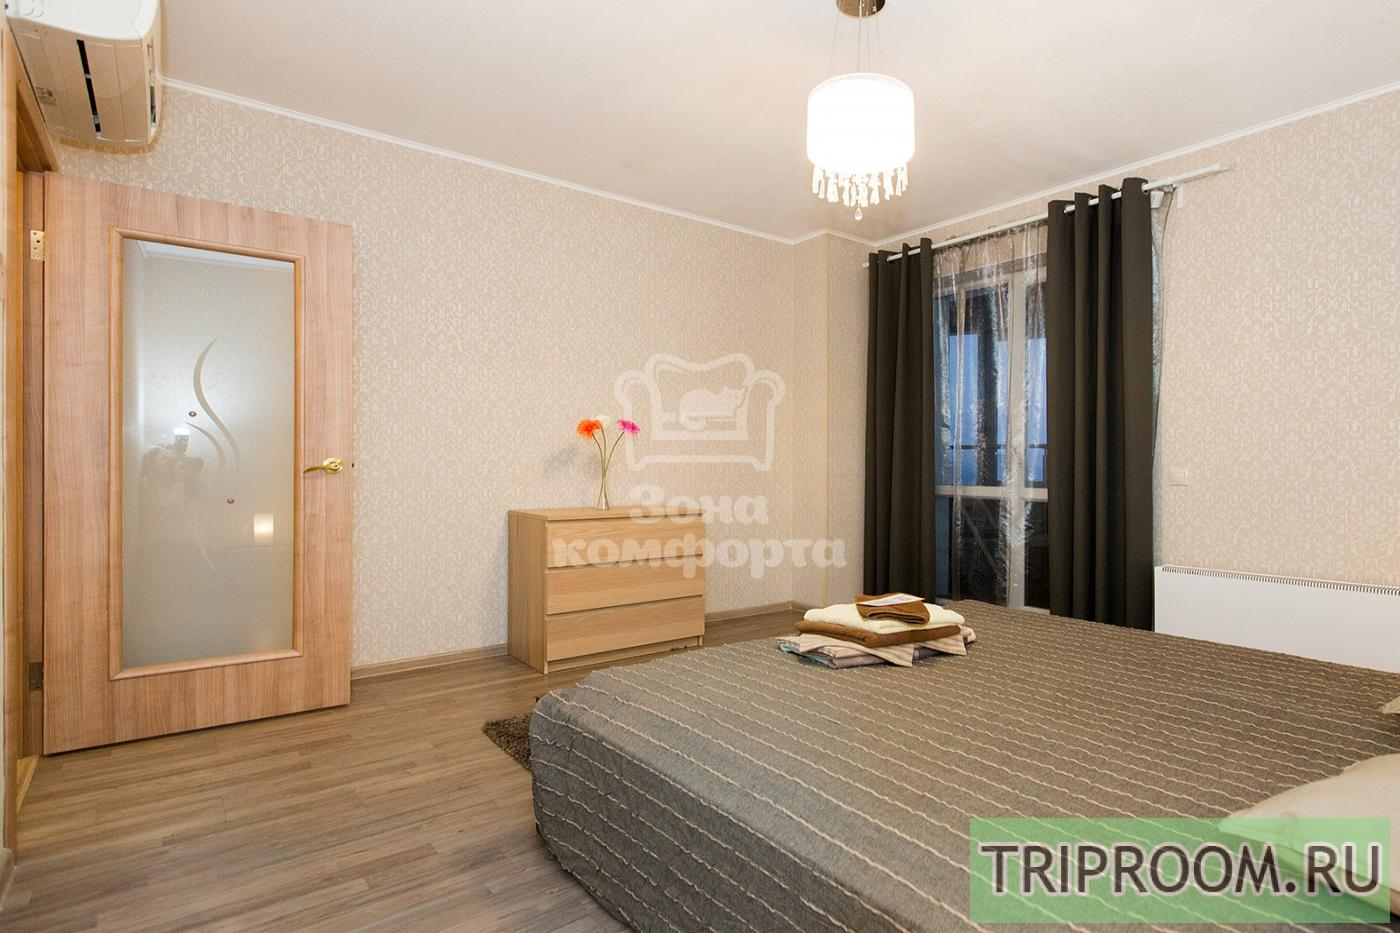 2-комнатная квартира посуточно (вариант № 34715), ул. Гагарина бульвар, фото № 8